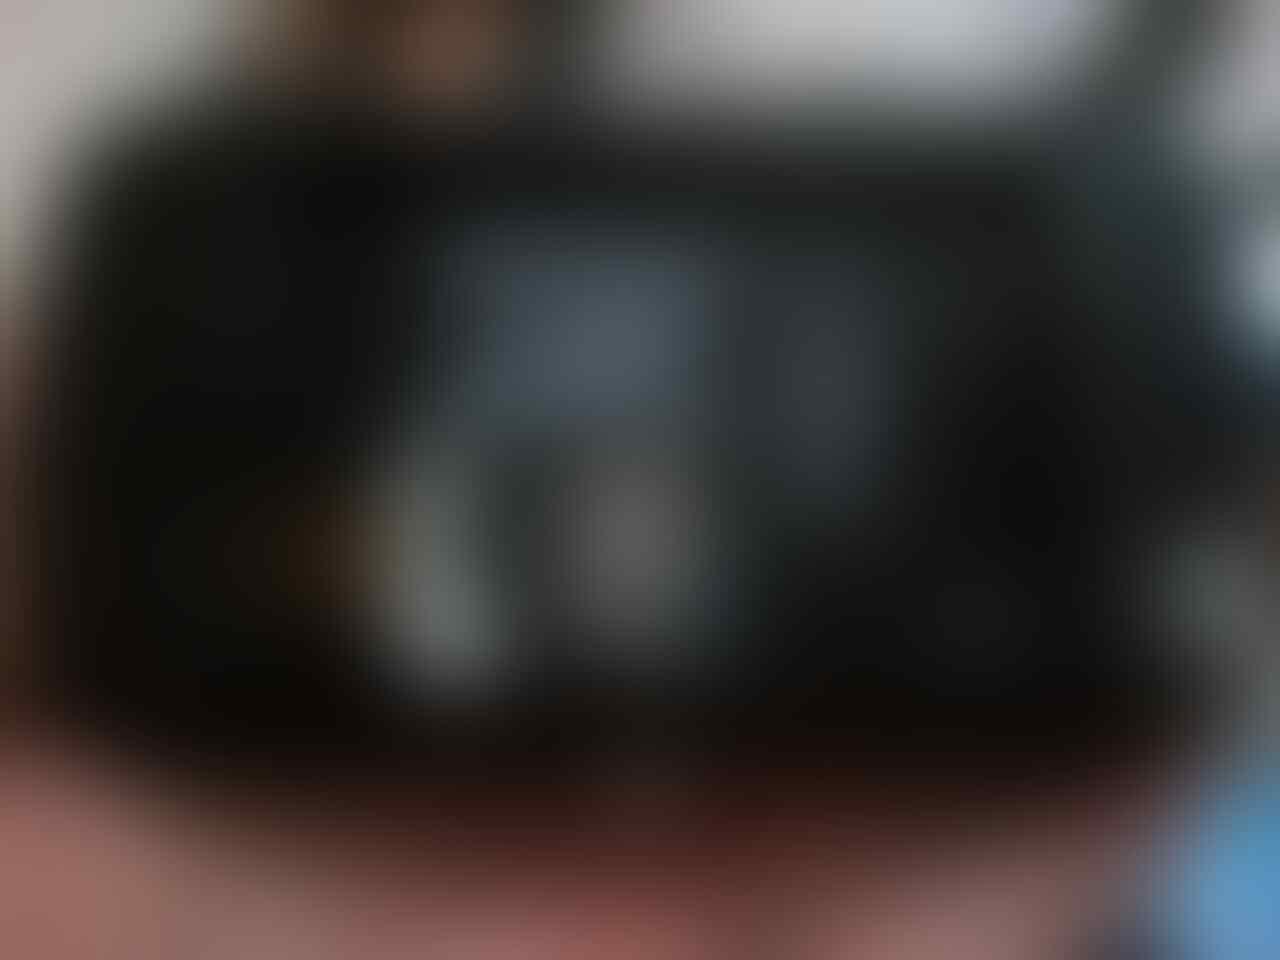 WTS blackberry davis 9220 masih garansi SS 5bulan